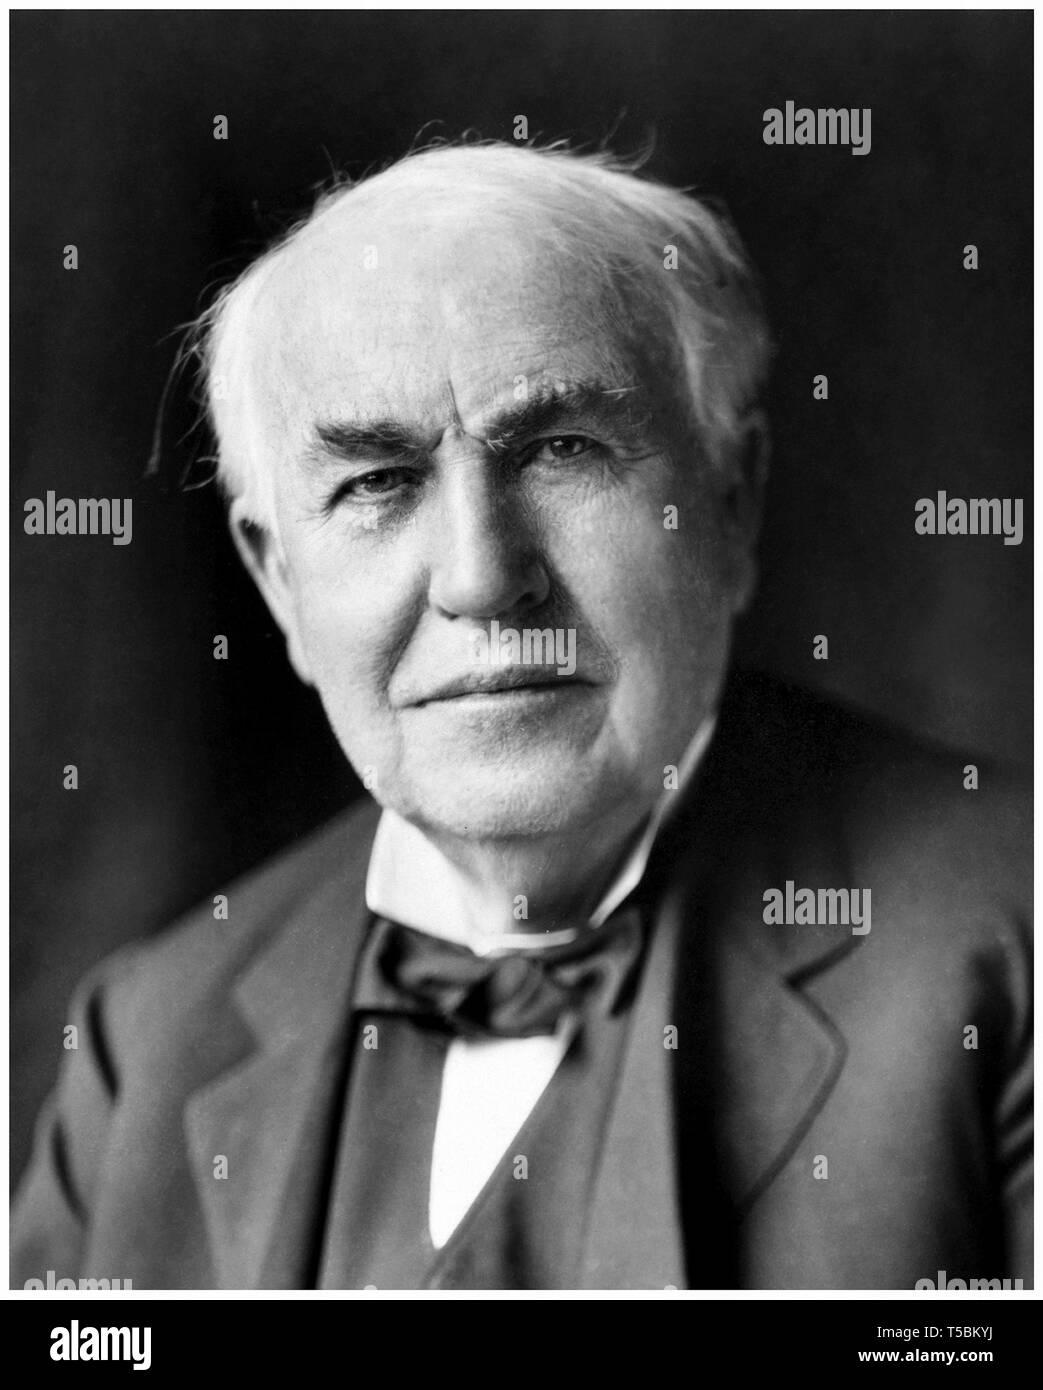 Thomas Edison (1847-1931), portrait, c. 1922 Stock Photo